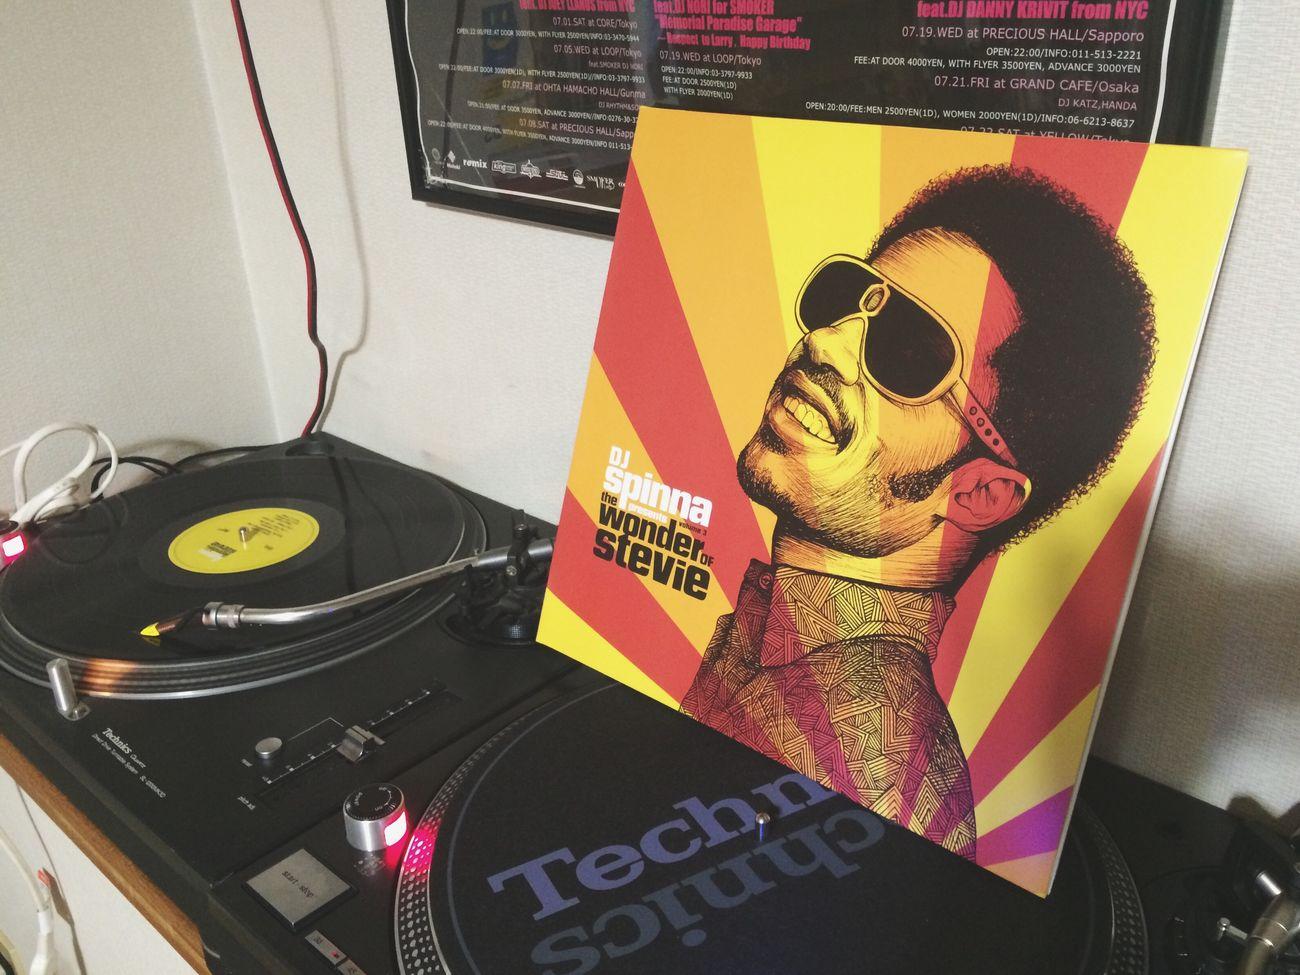 Vinyl Vinyl Records Records Di Spinna Good Music Stevie Wonder Technics Nice Turntable